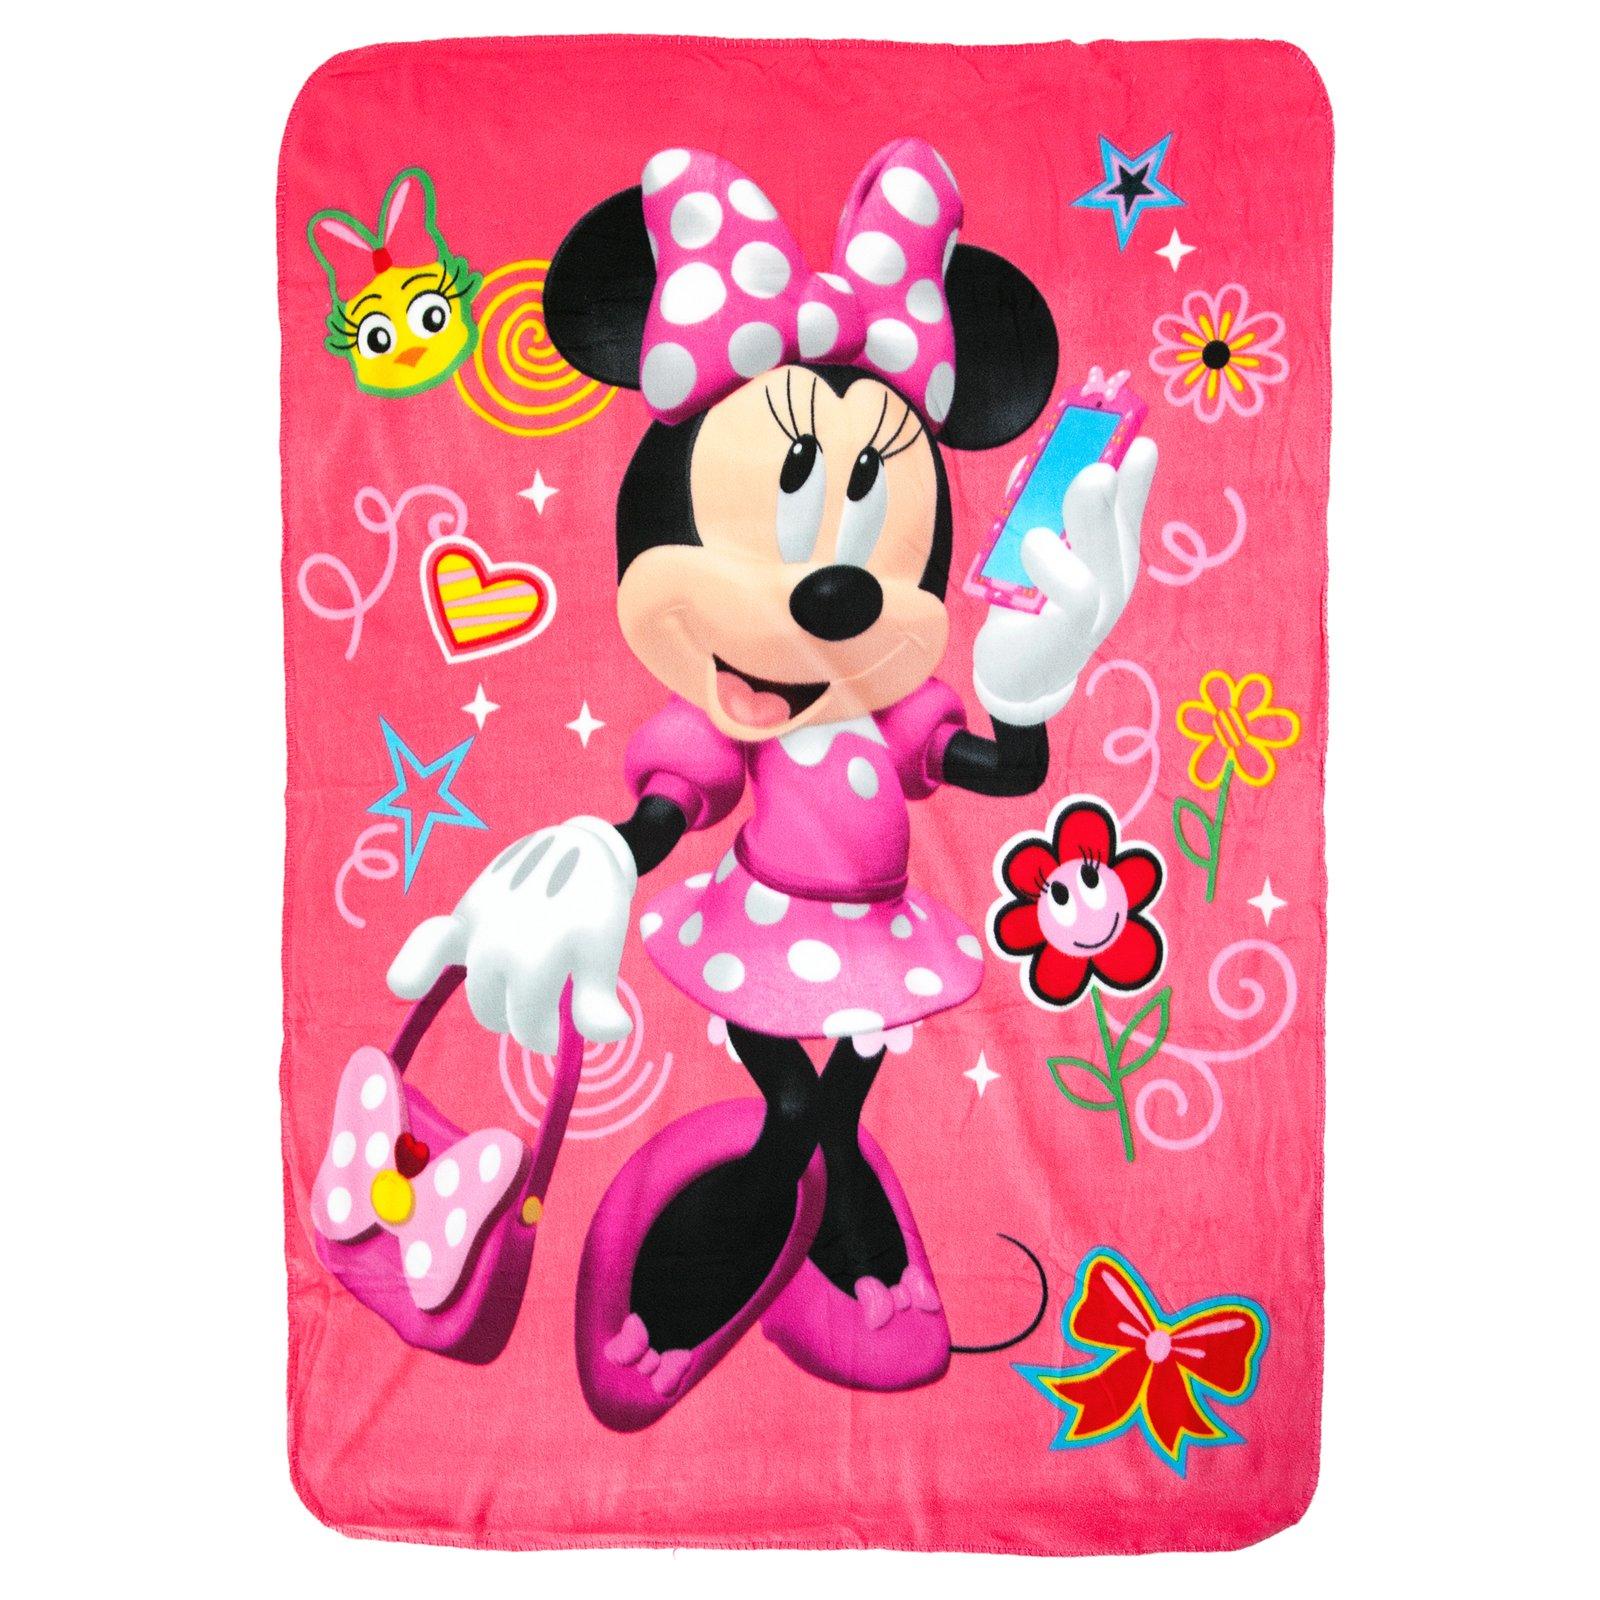 Disney Junior Minnie Mouse Fleece Throw Blanket Kids Home Decor 45 x 60 Inch